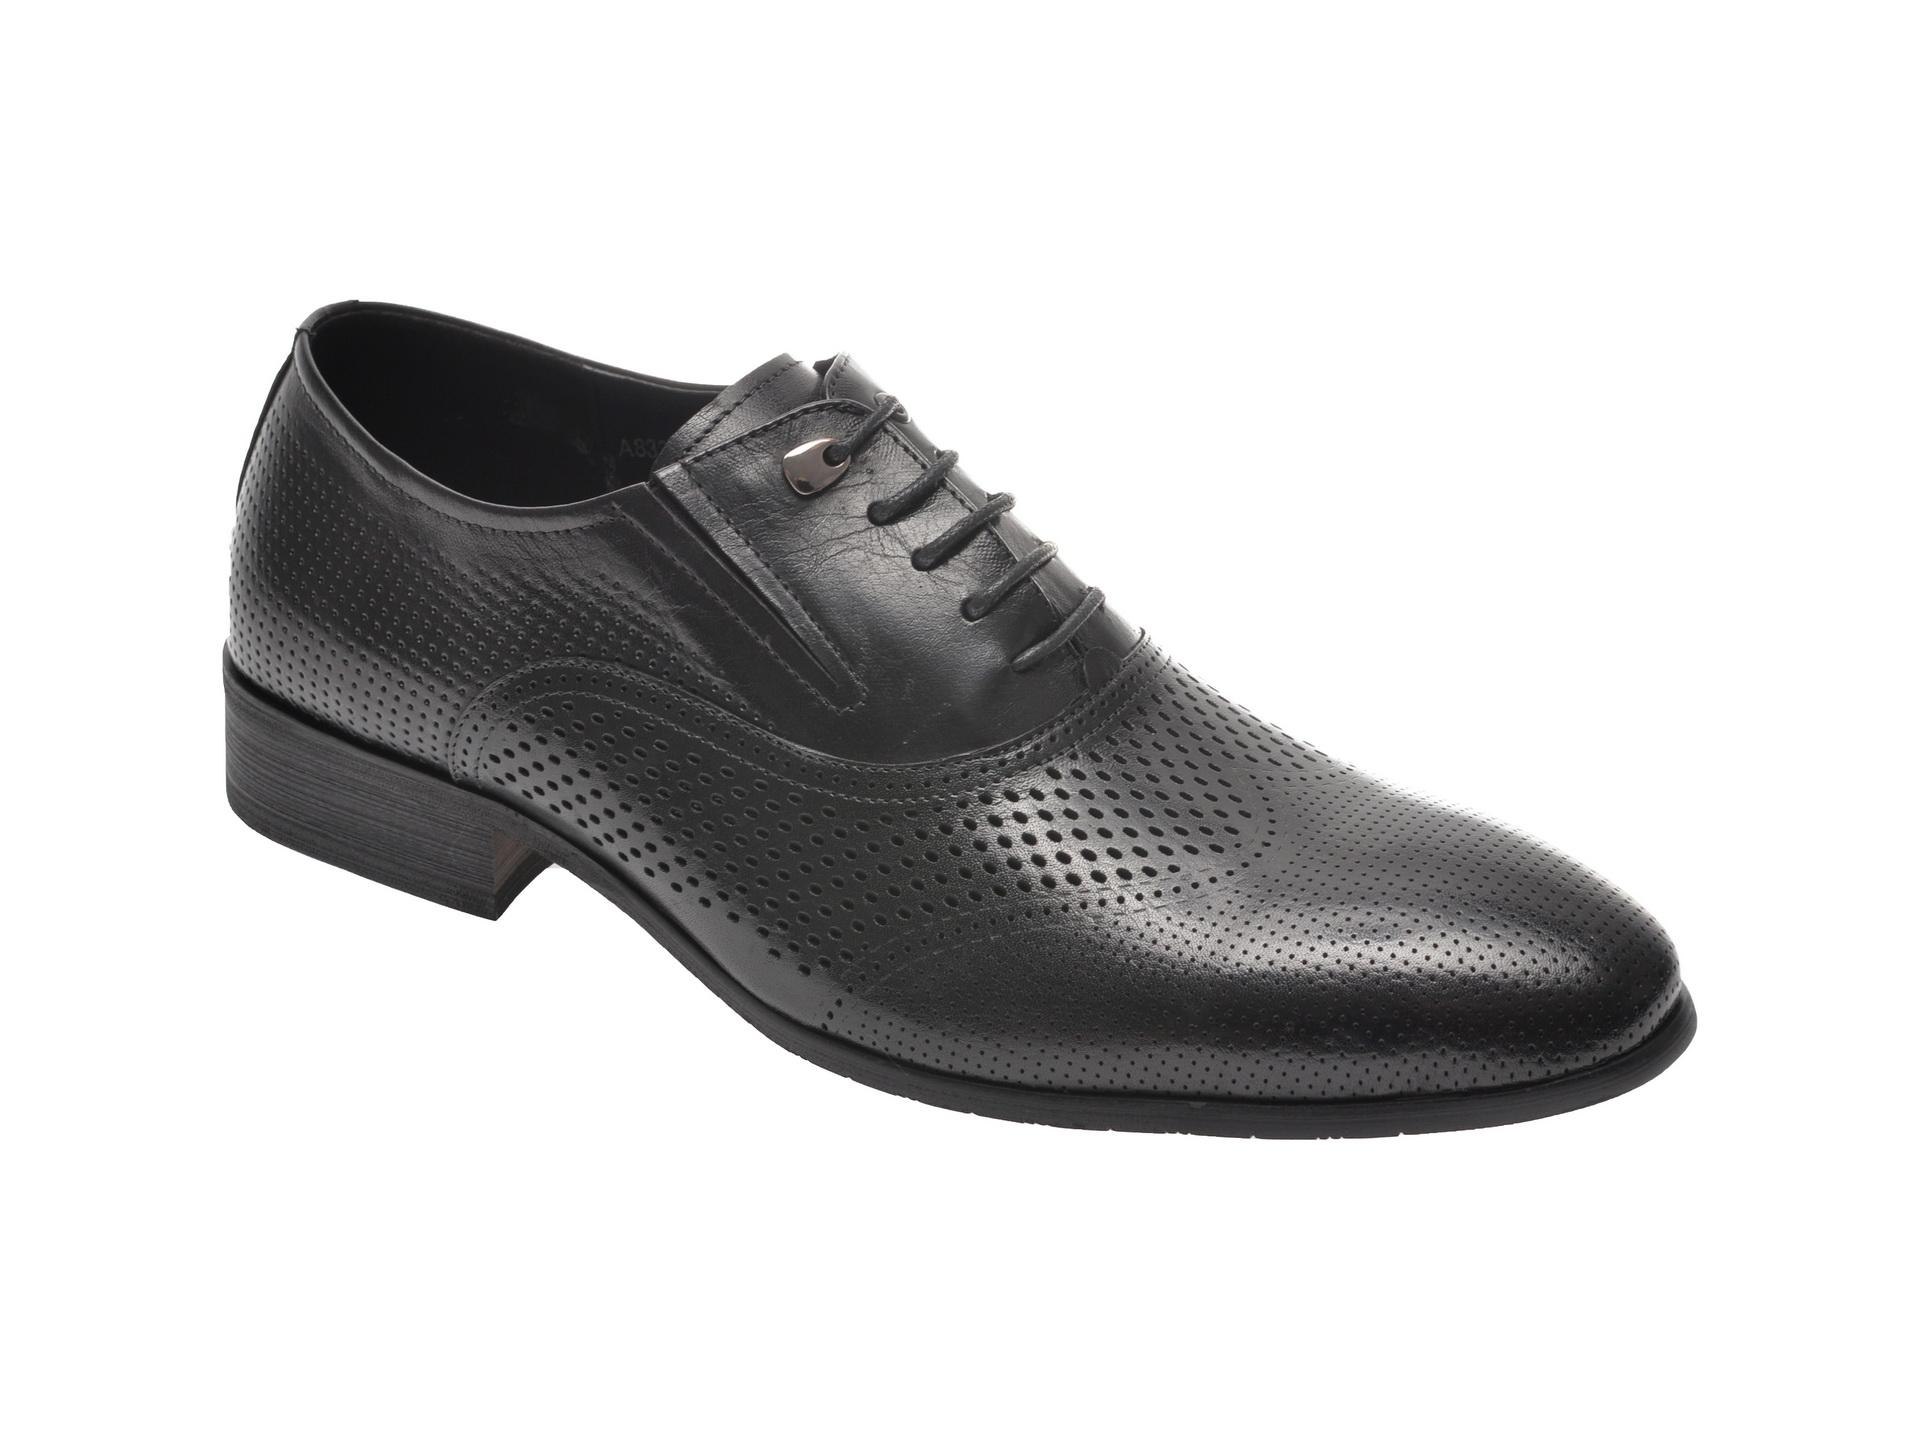 Pantofi OTTER negri, A833001, din piele naturala imagine